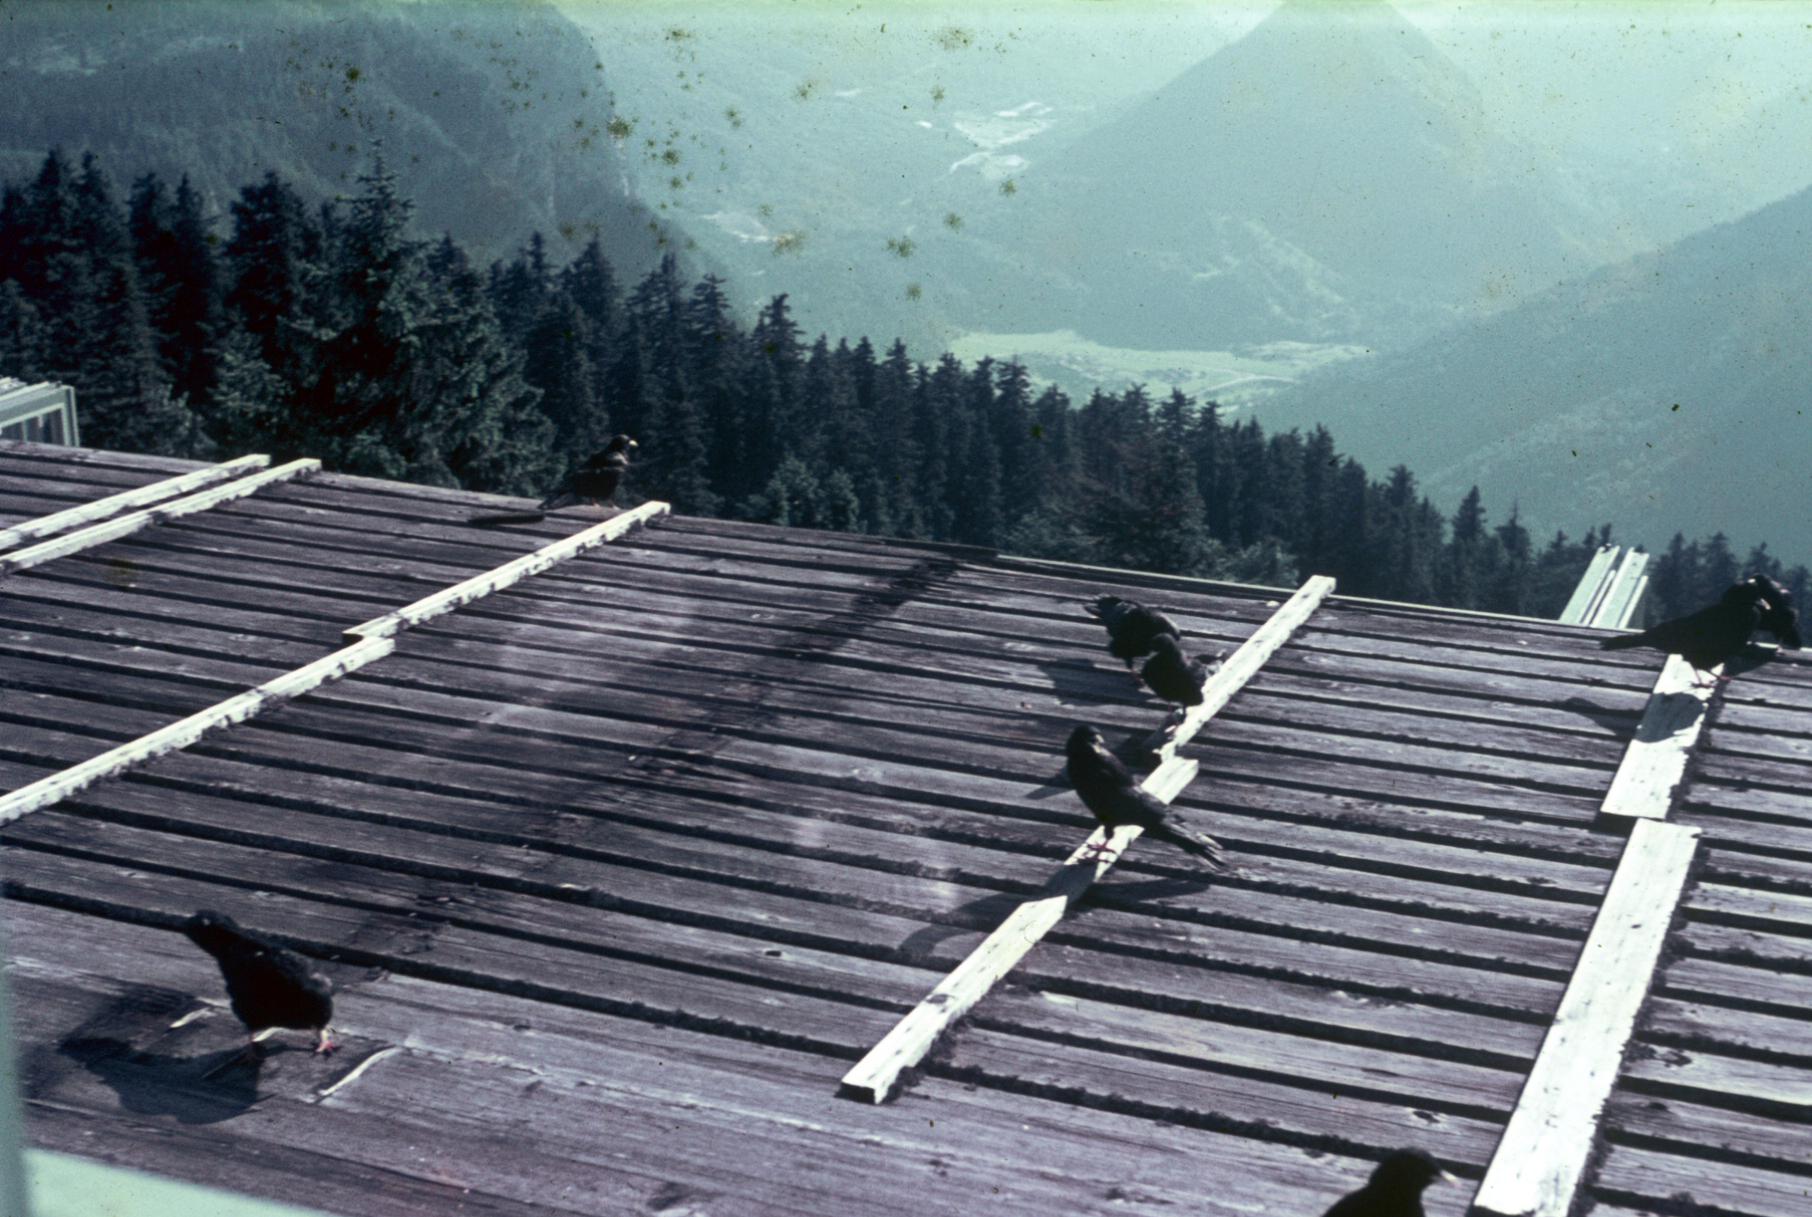 Ravens on roof.